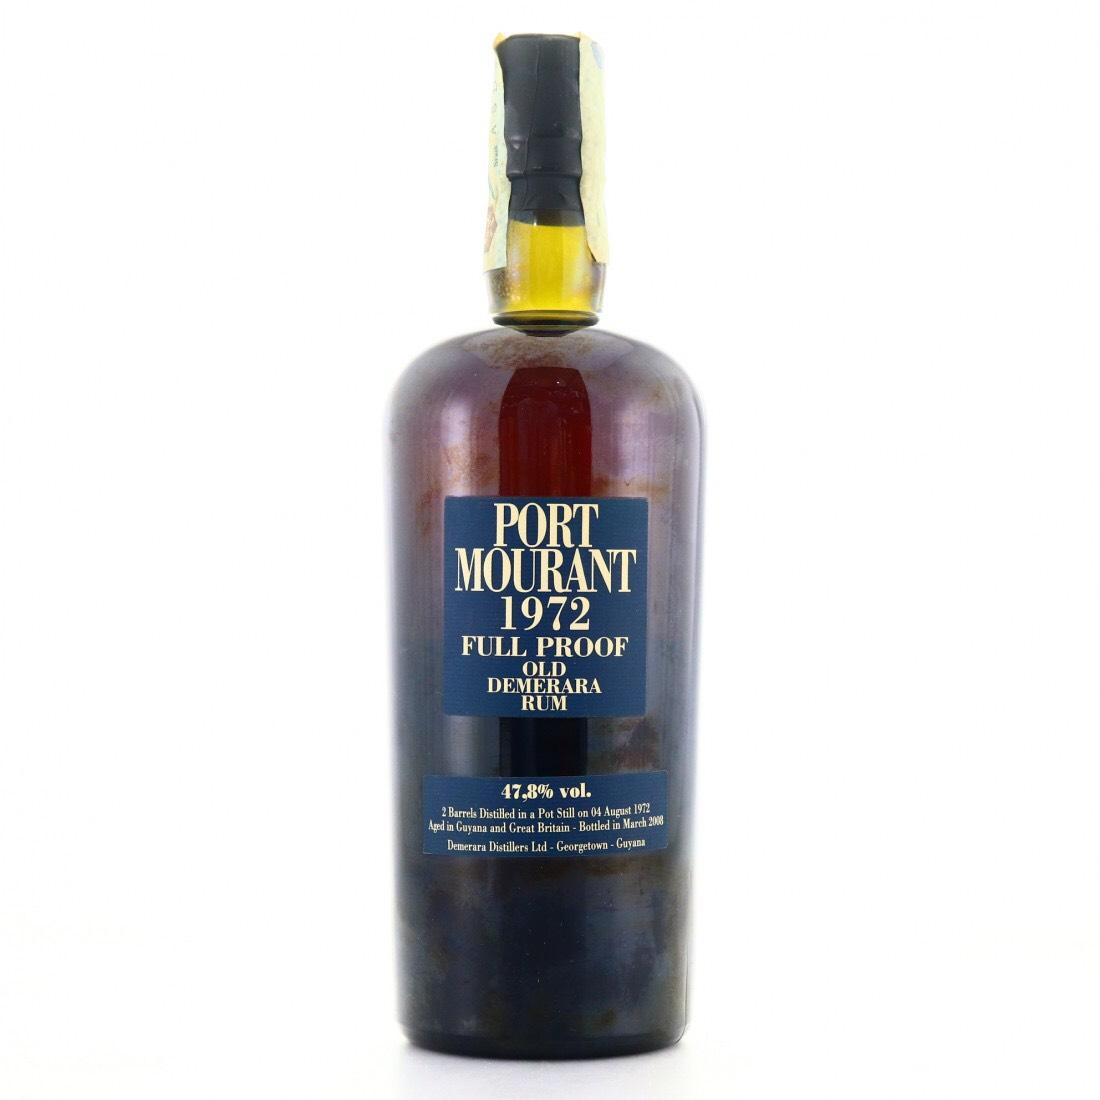 Bottle image of PM